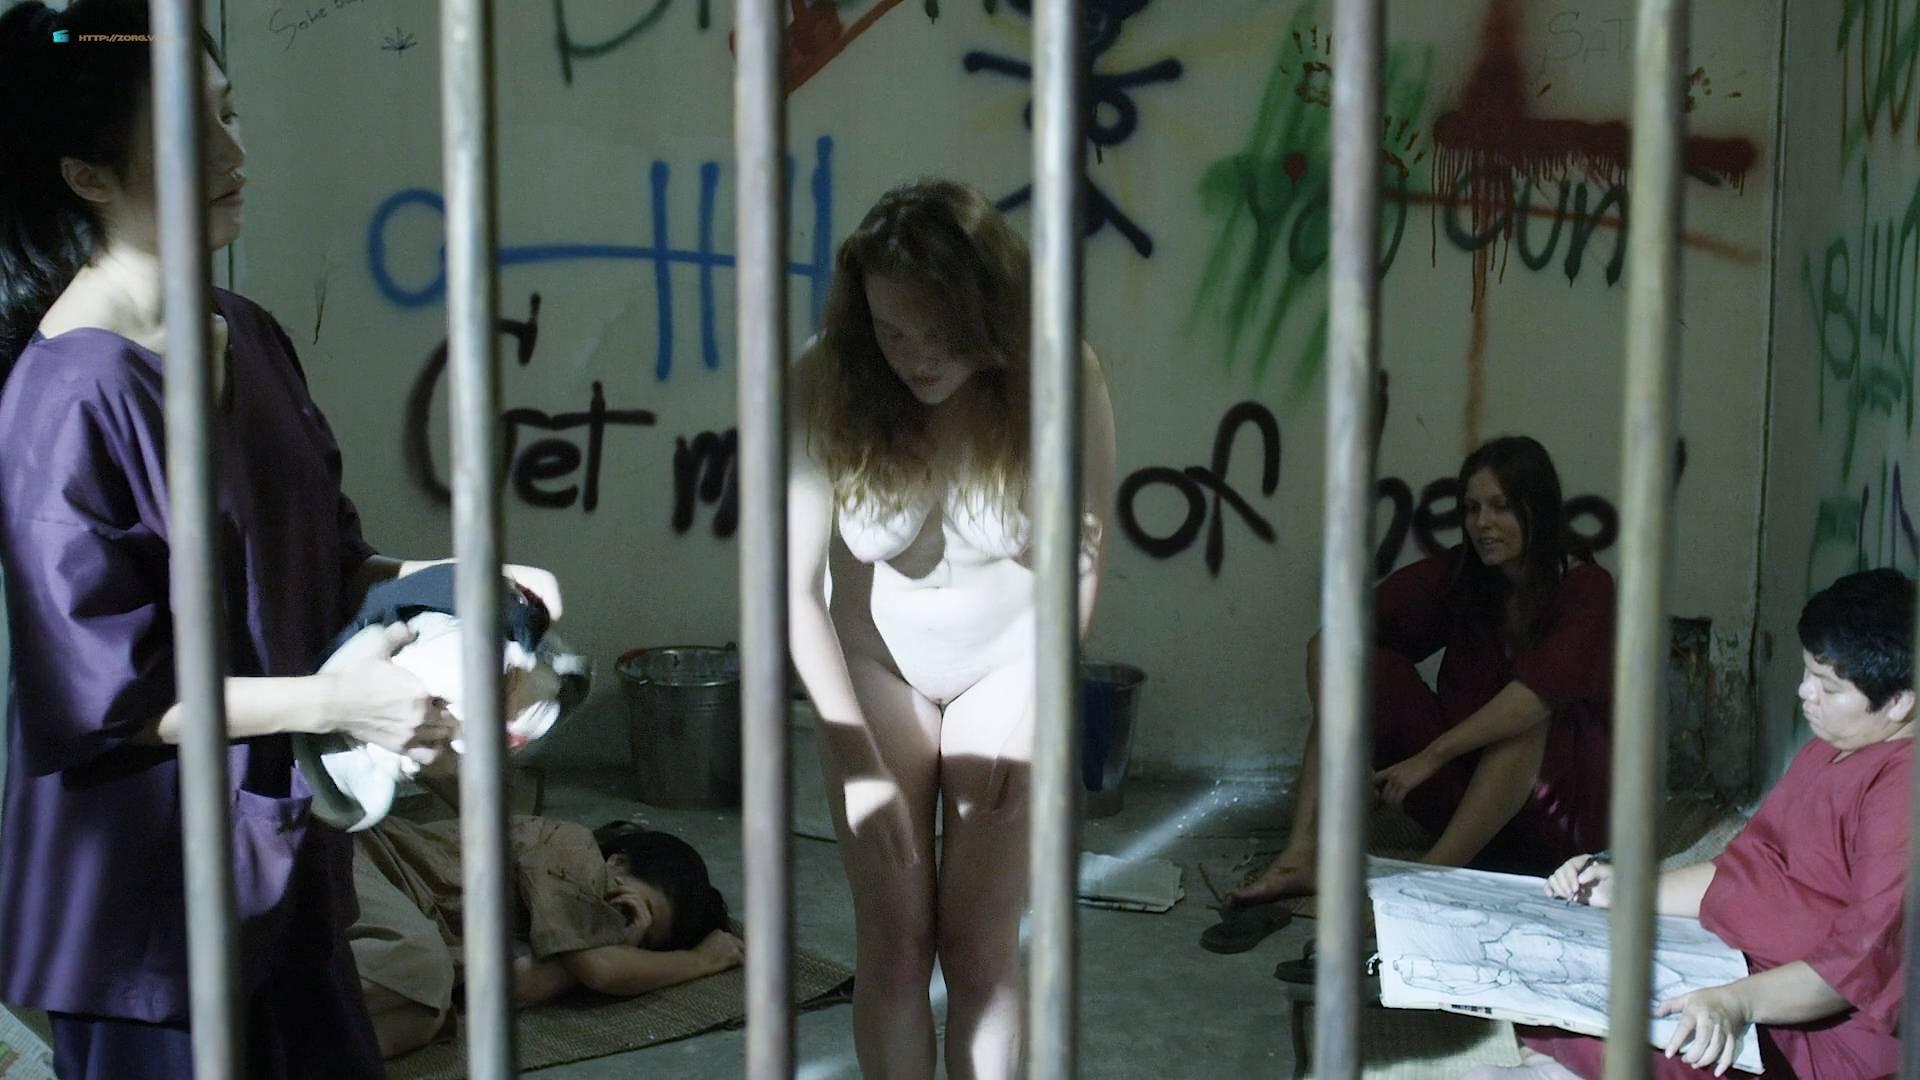 Kelly-McCart-nude-full-frontal-Katrina-Grey-nude-lesbian-sex-Locked-Up-2017-HD-1080p-Web-001.jpg